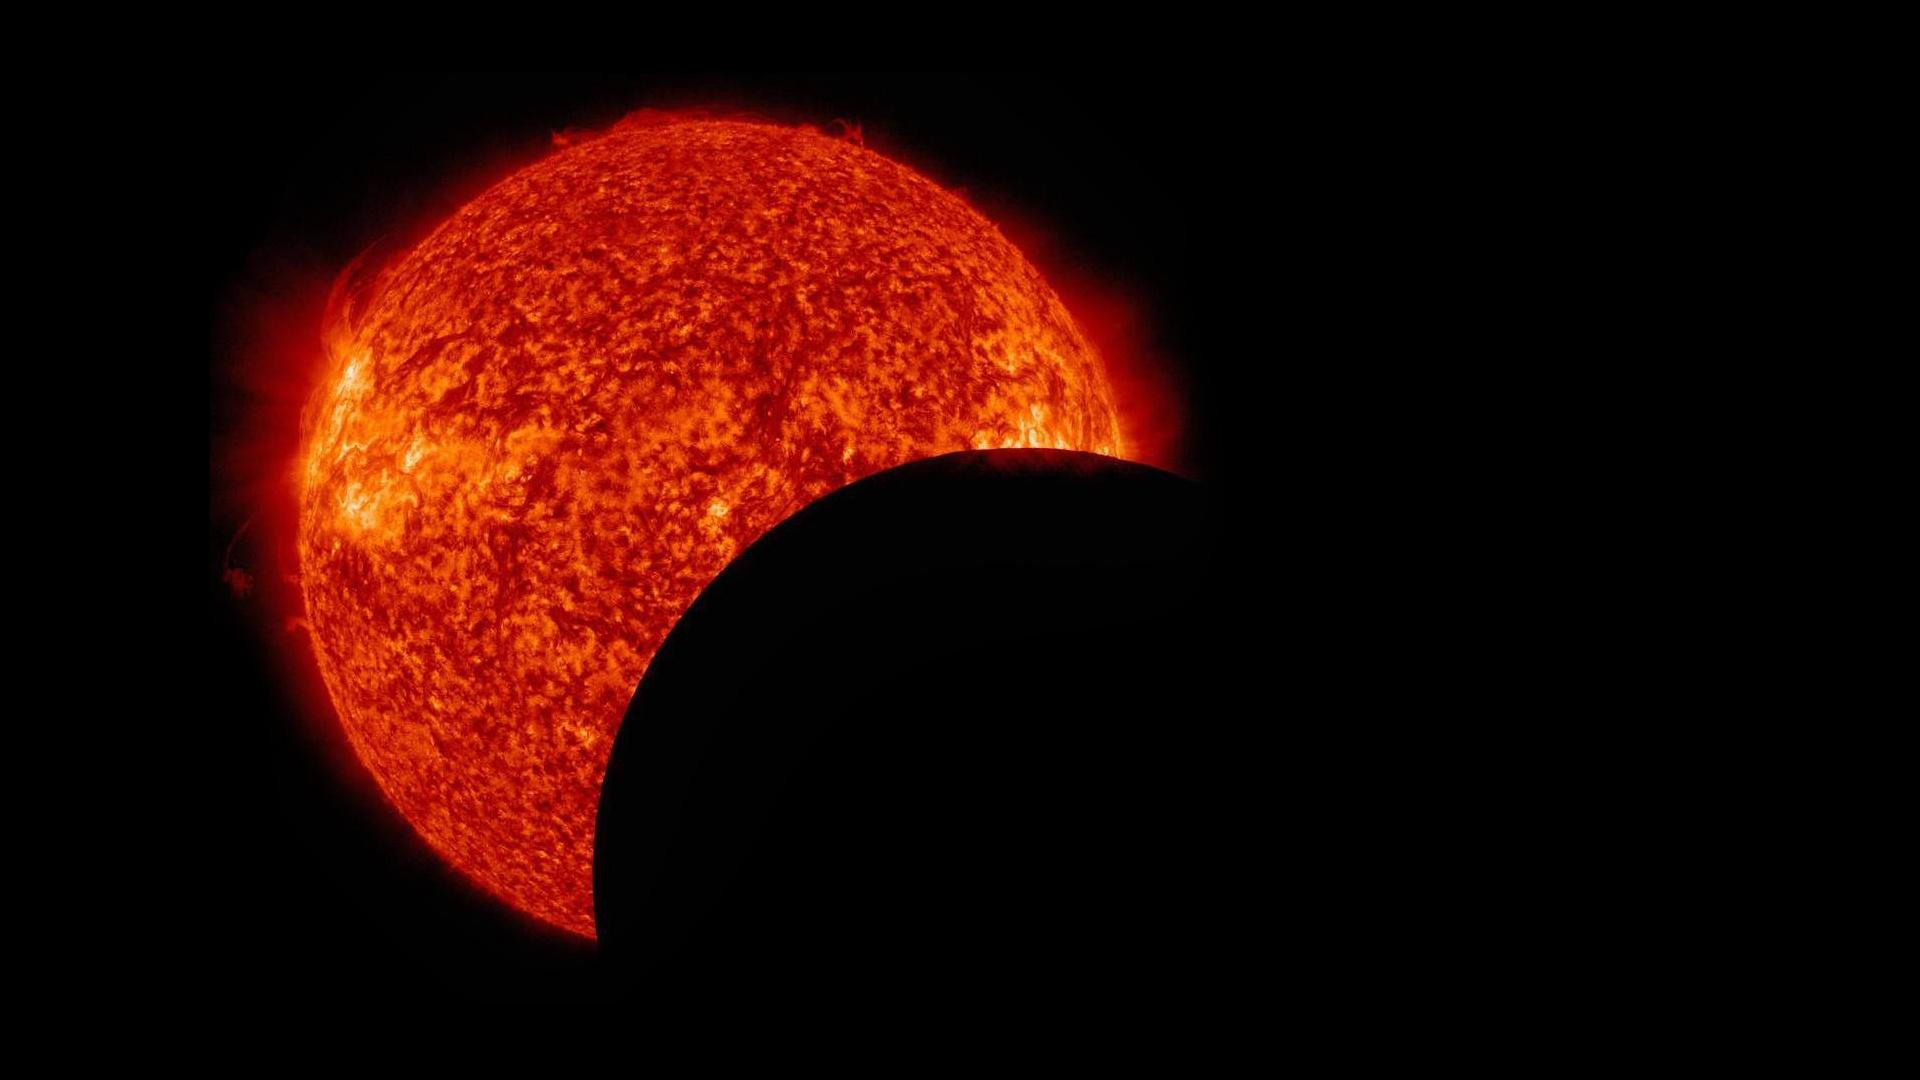 S44 Ep11: Eclipse Over America